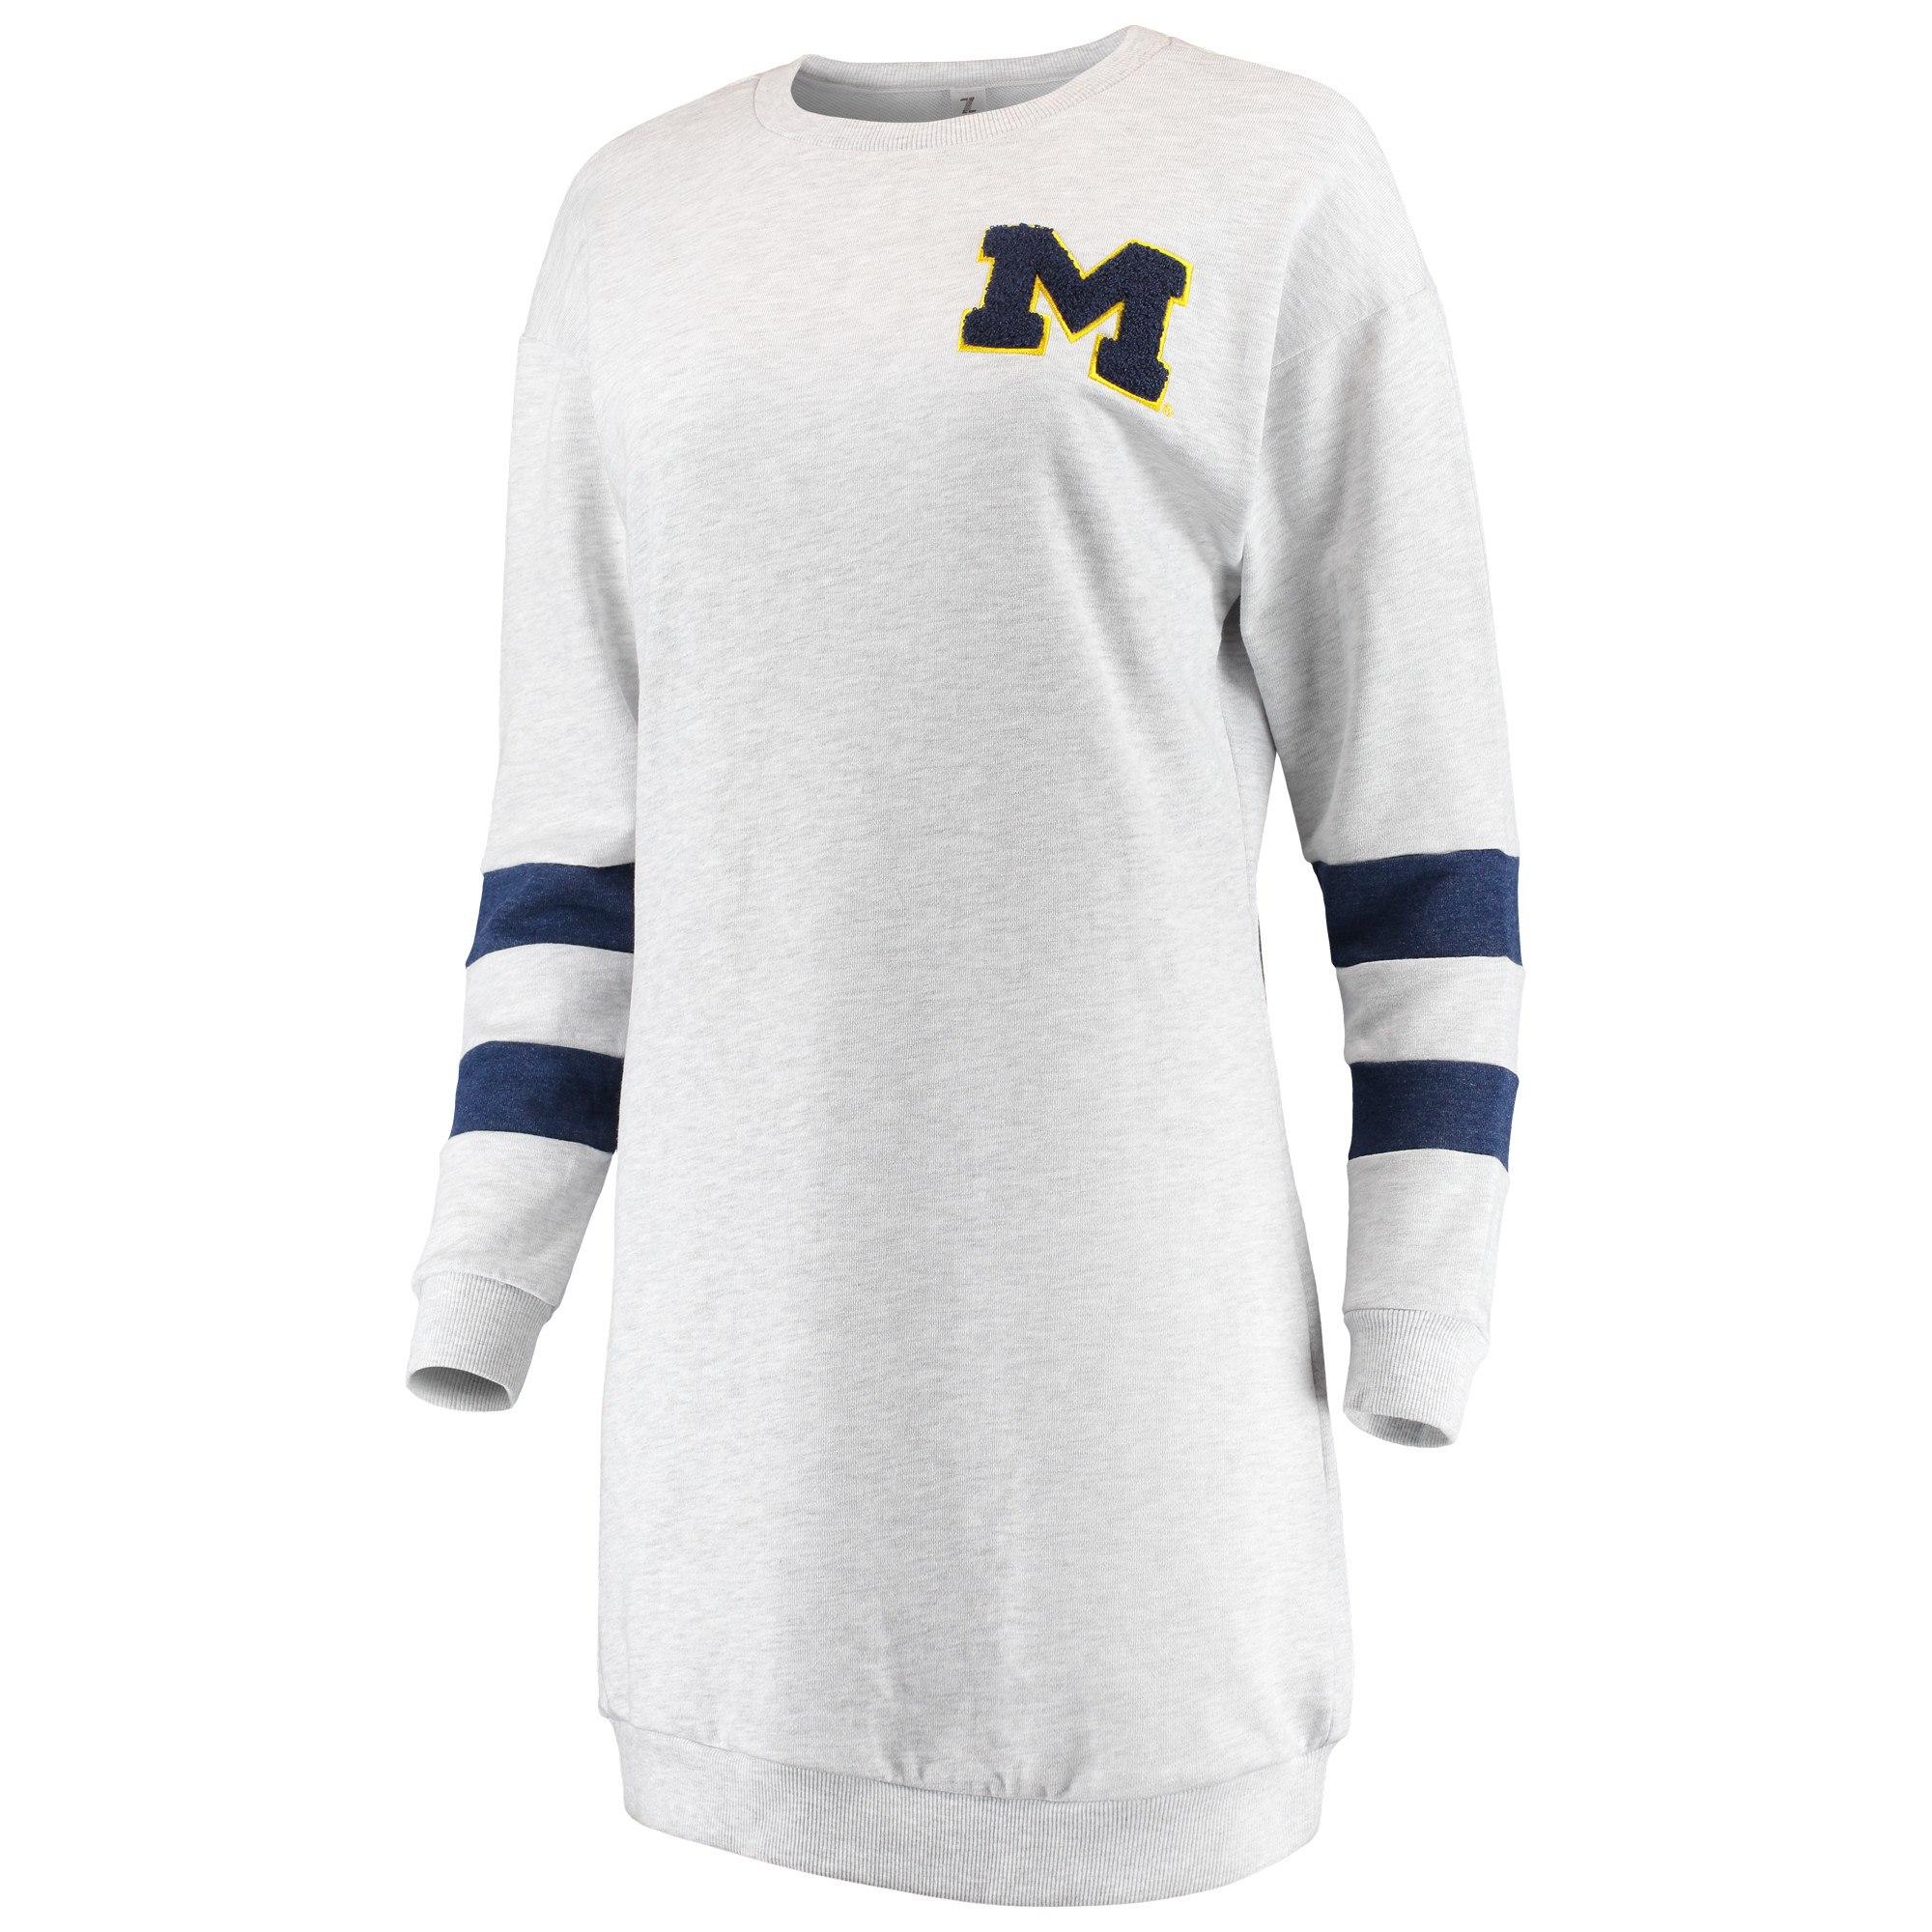 Zoozatz University of Michigan Women's Gray Varsity Sweatshirt Dress